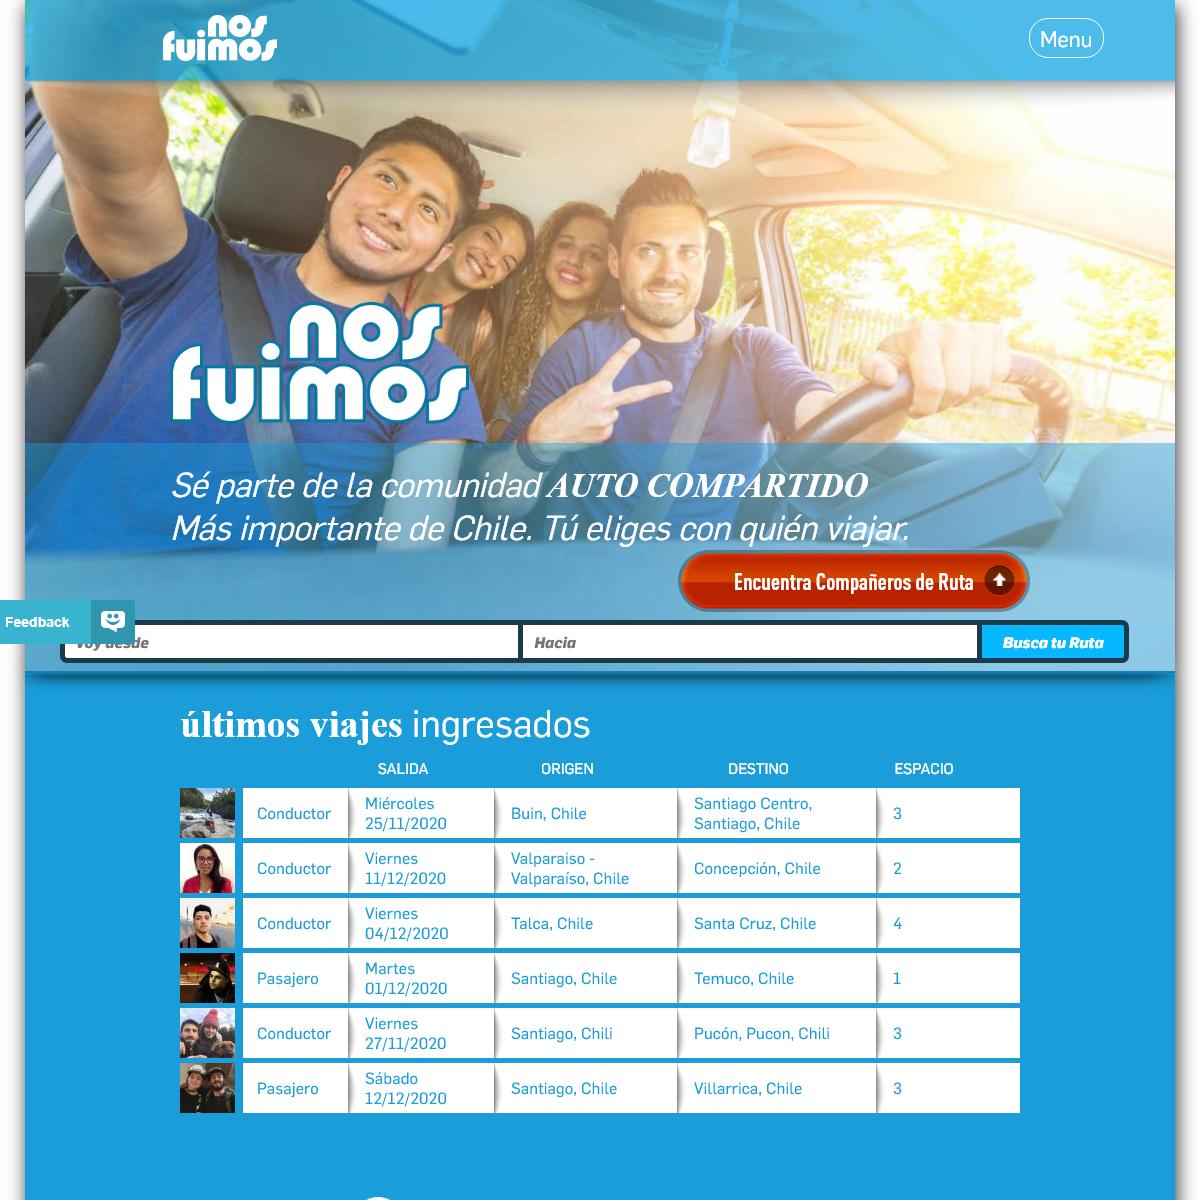 NosFuimos.cl - Auto Compartido de Chile